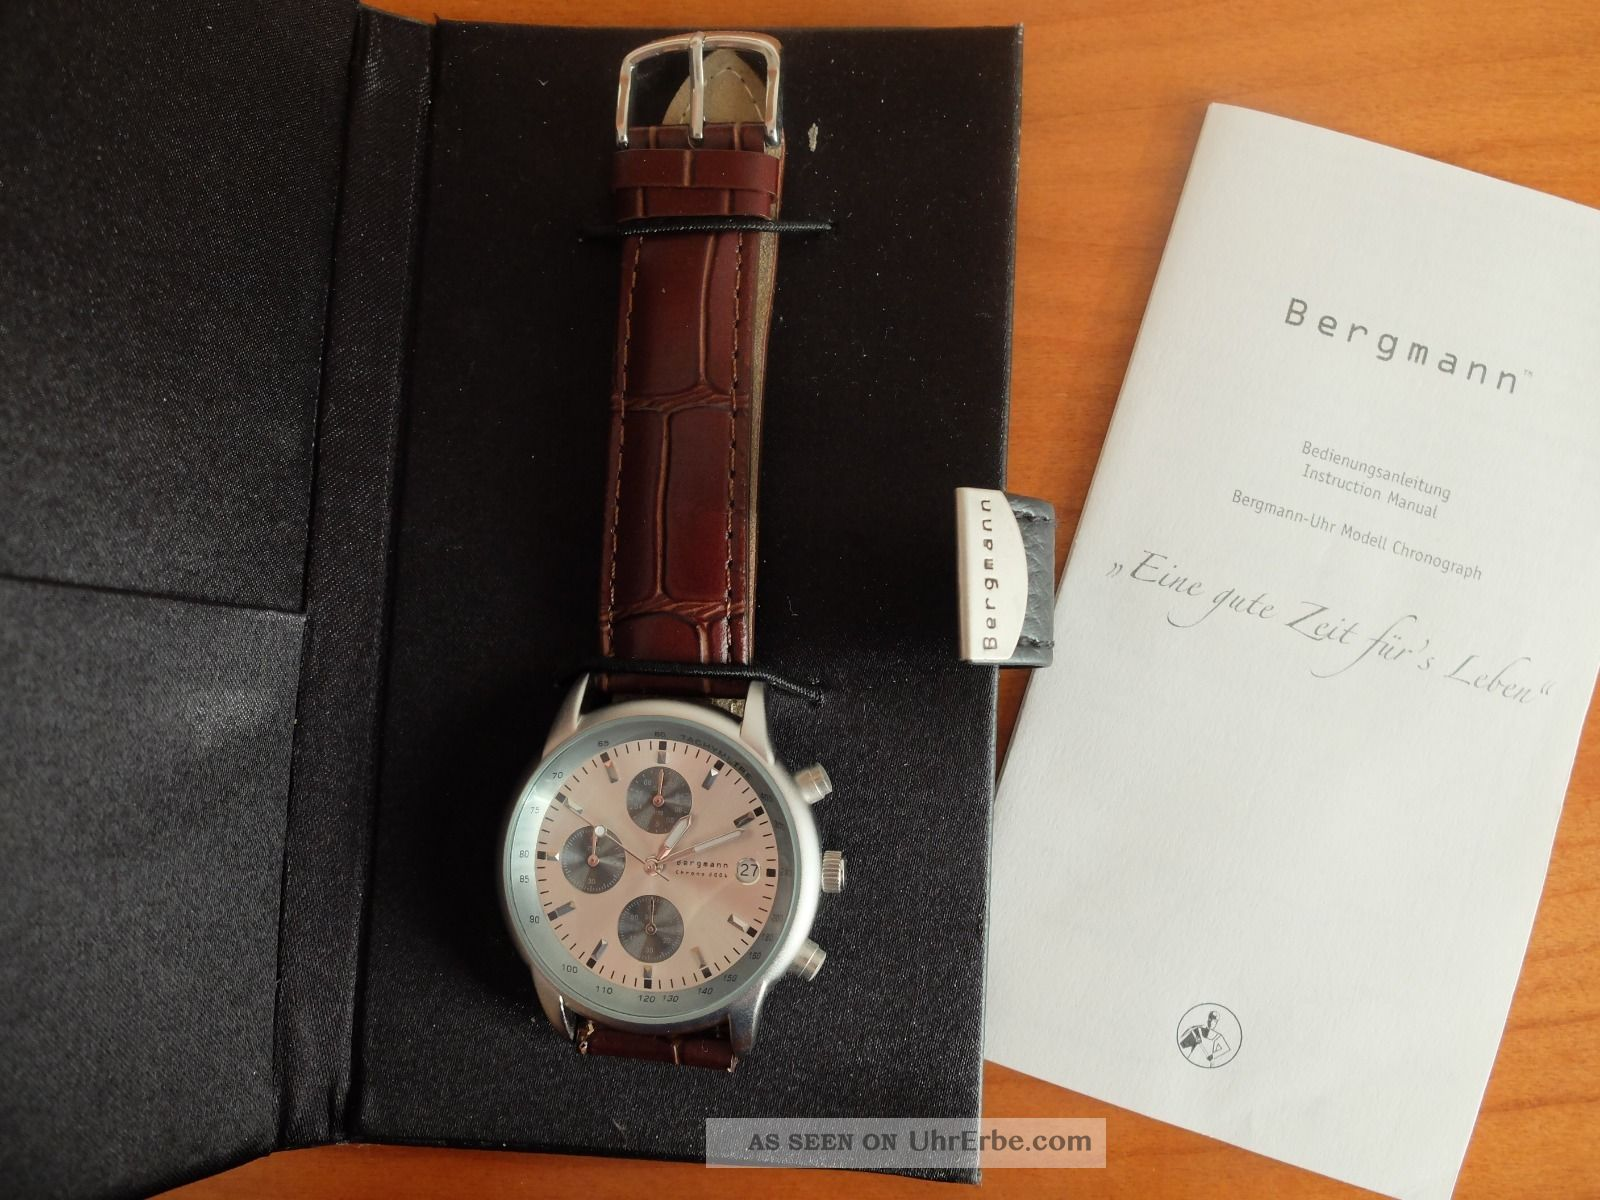 Herren Armbanduhr Bergmann 2006 Chronograph Armbanduhren Bild